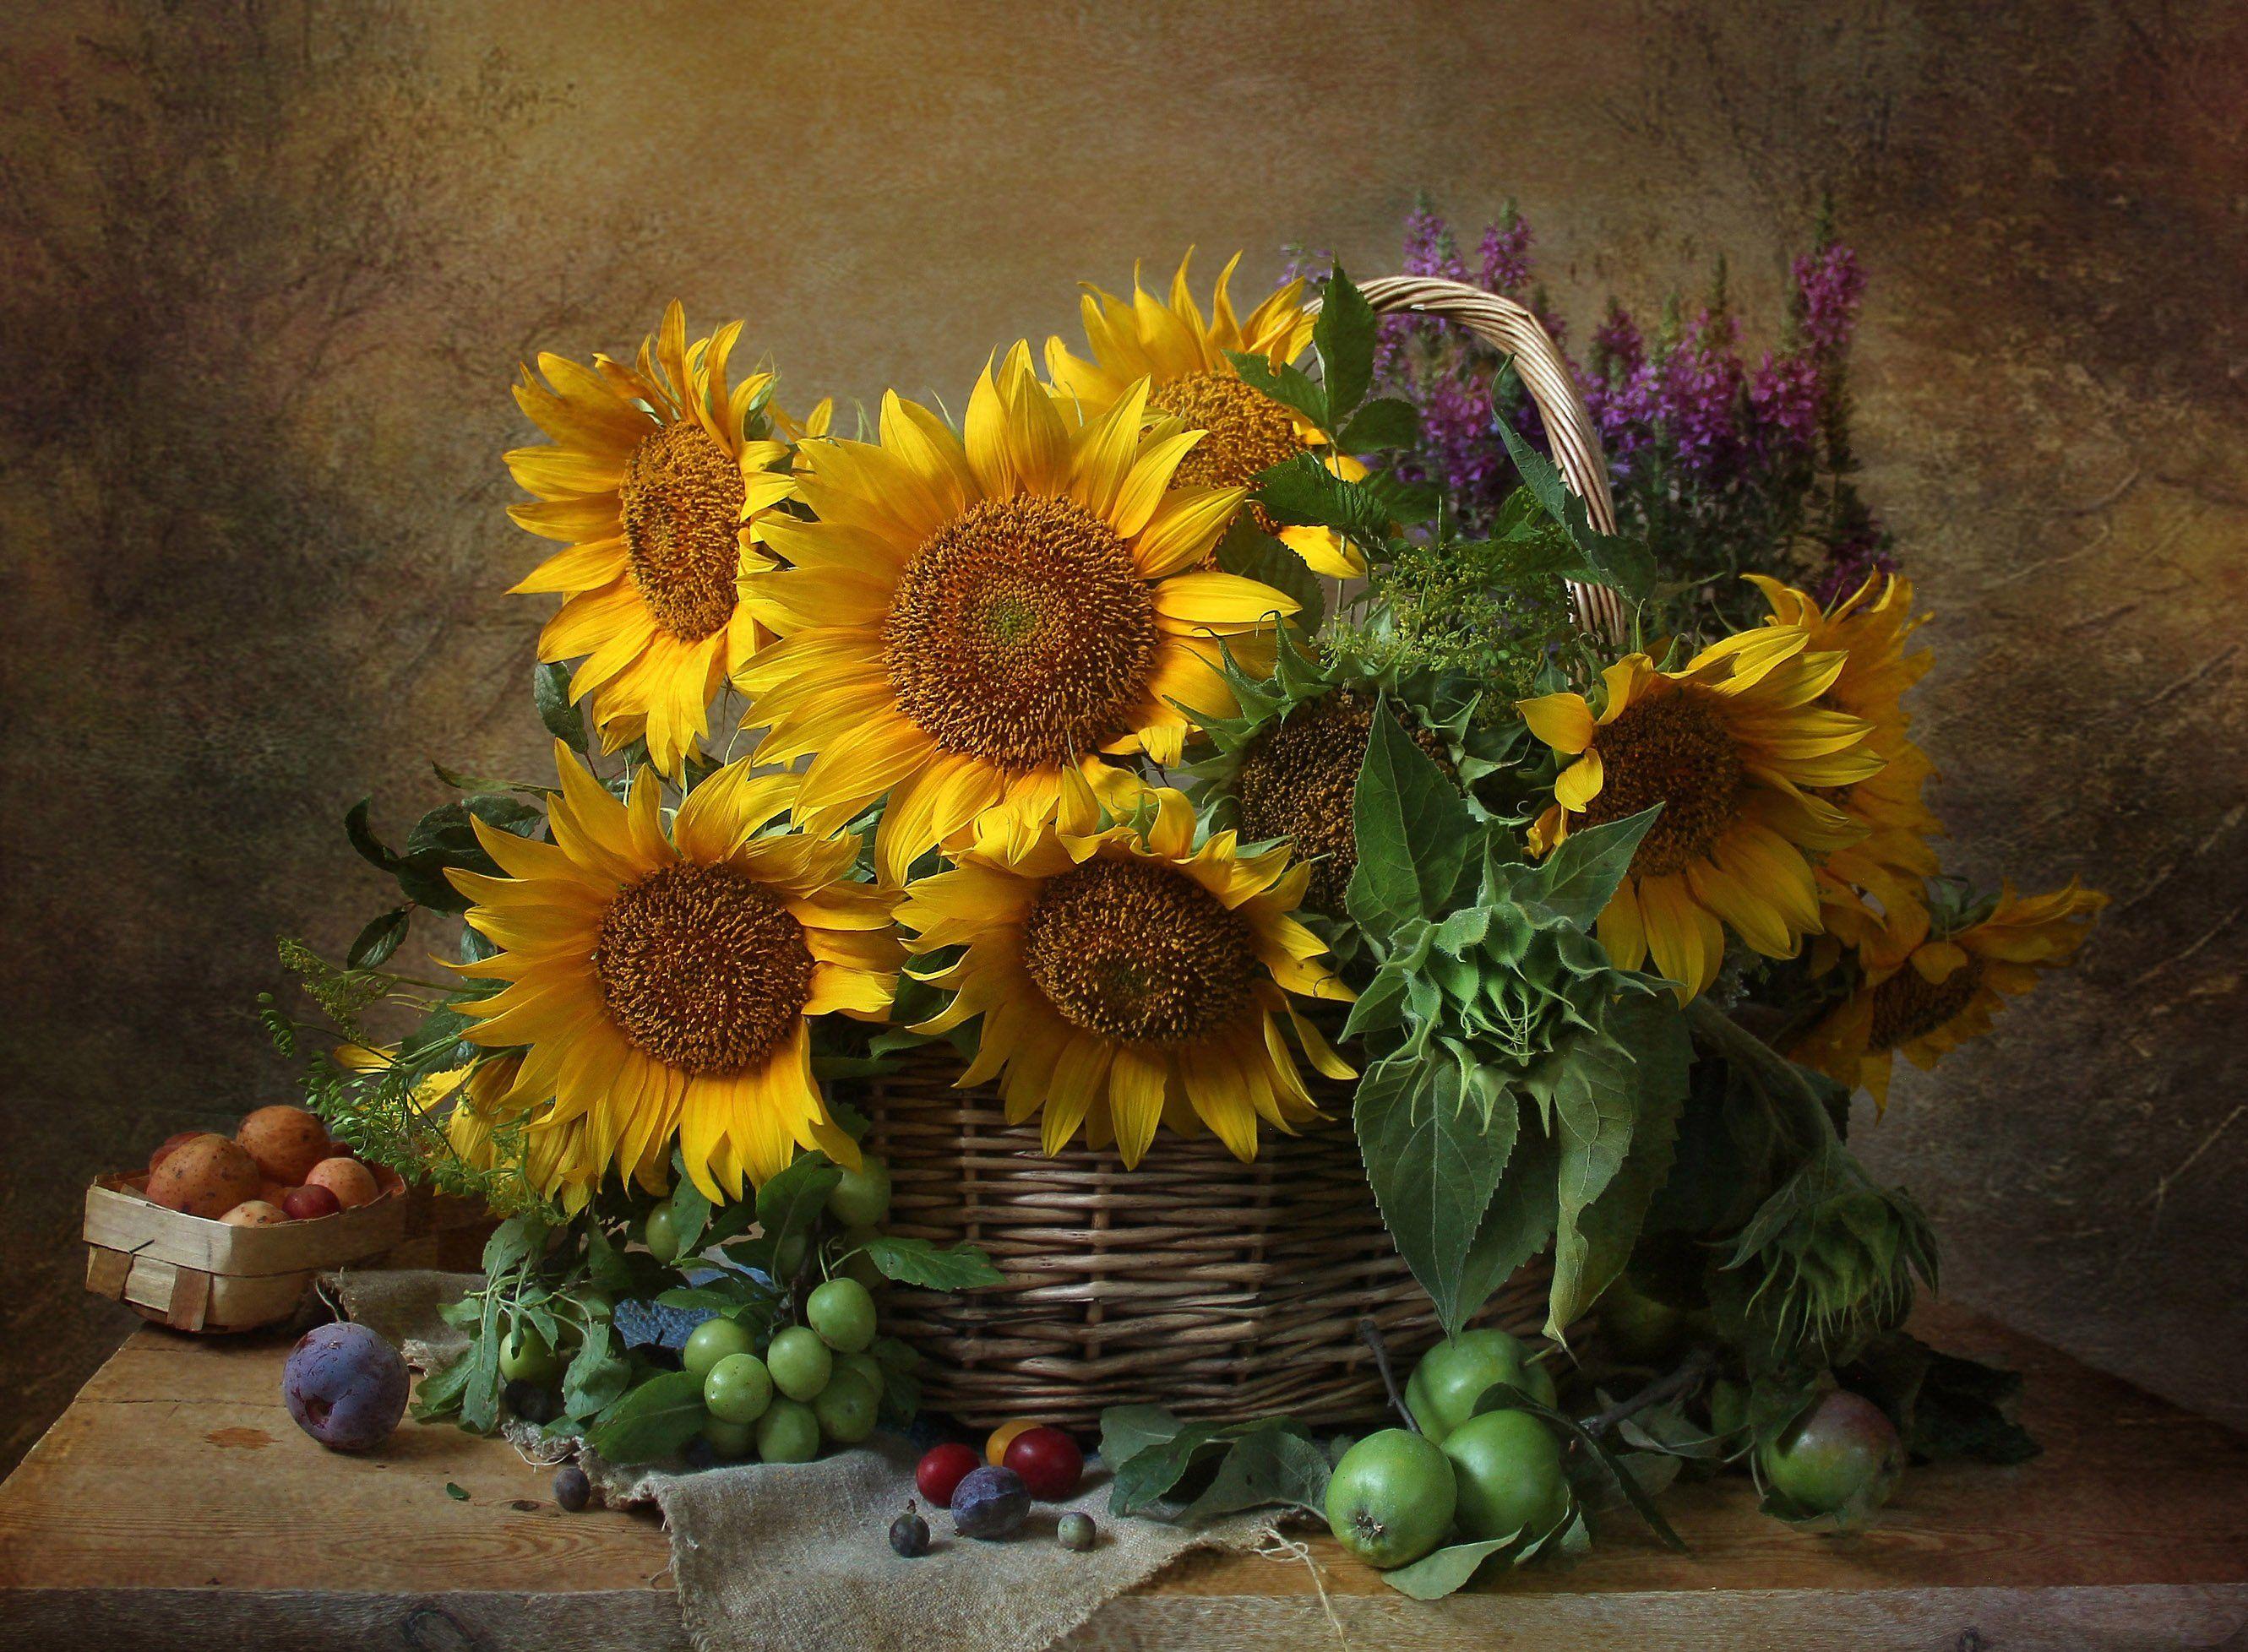 Натюрморт с подсолнухами и фруктами Марина Филатова